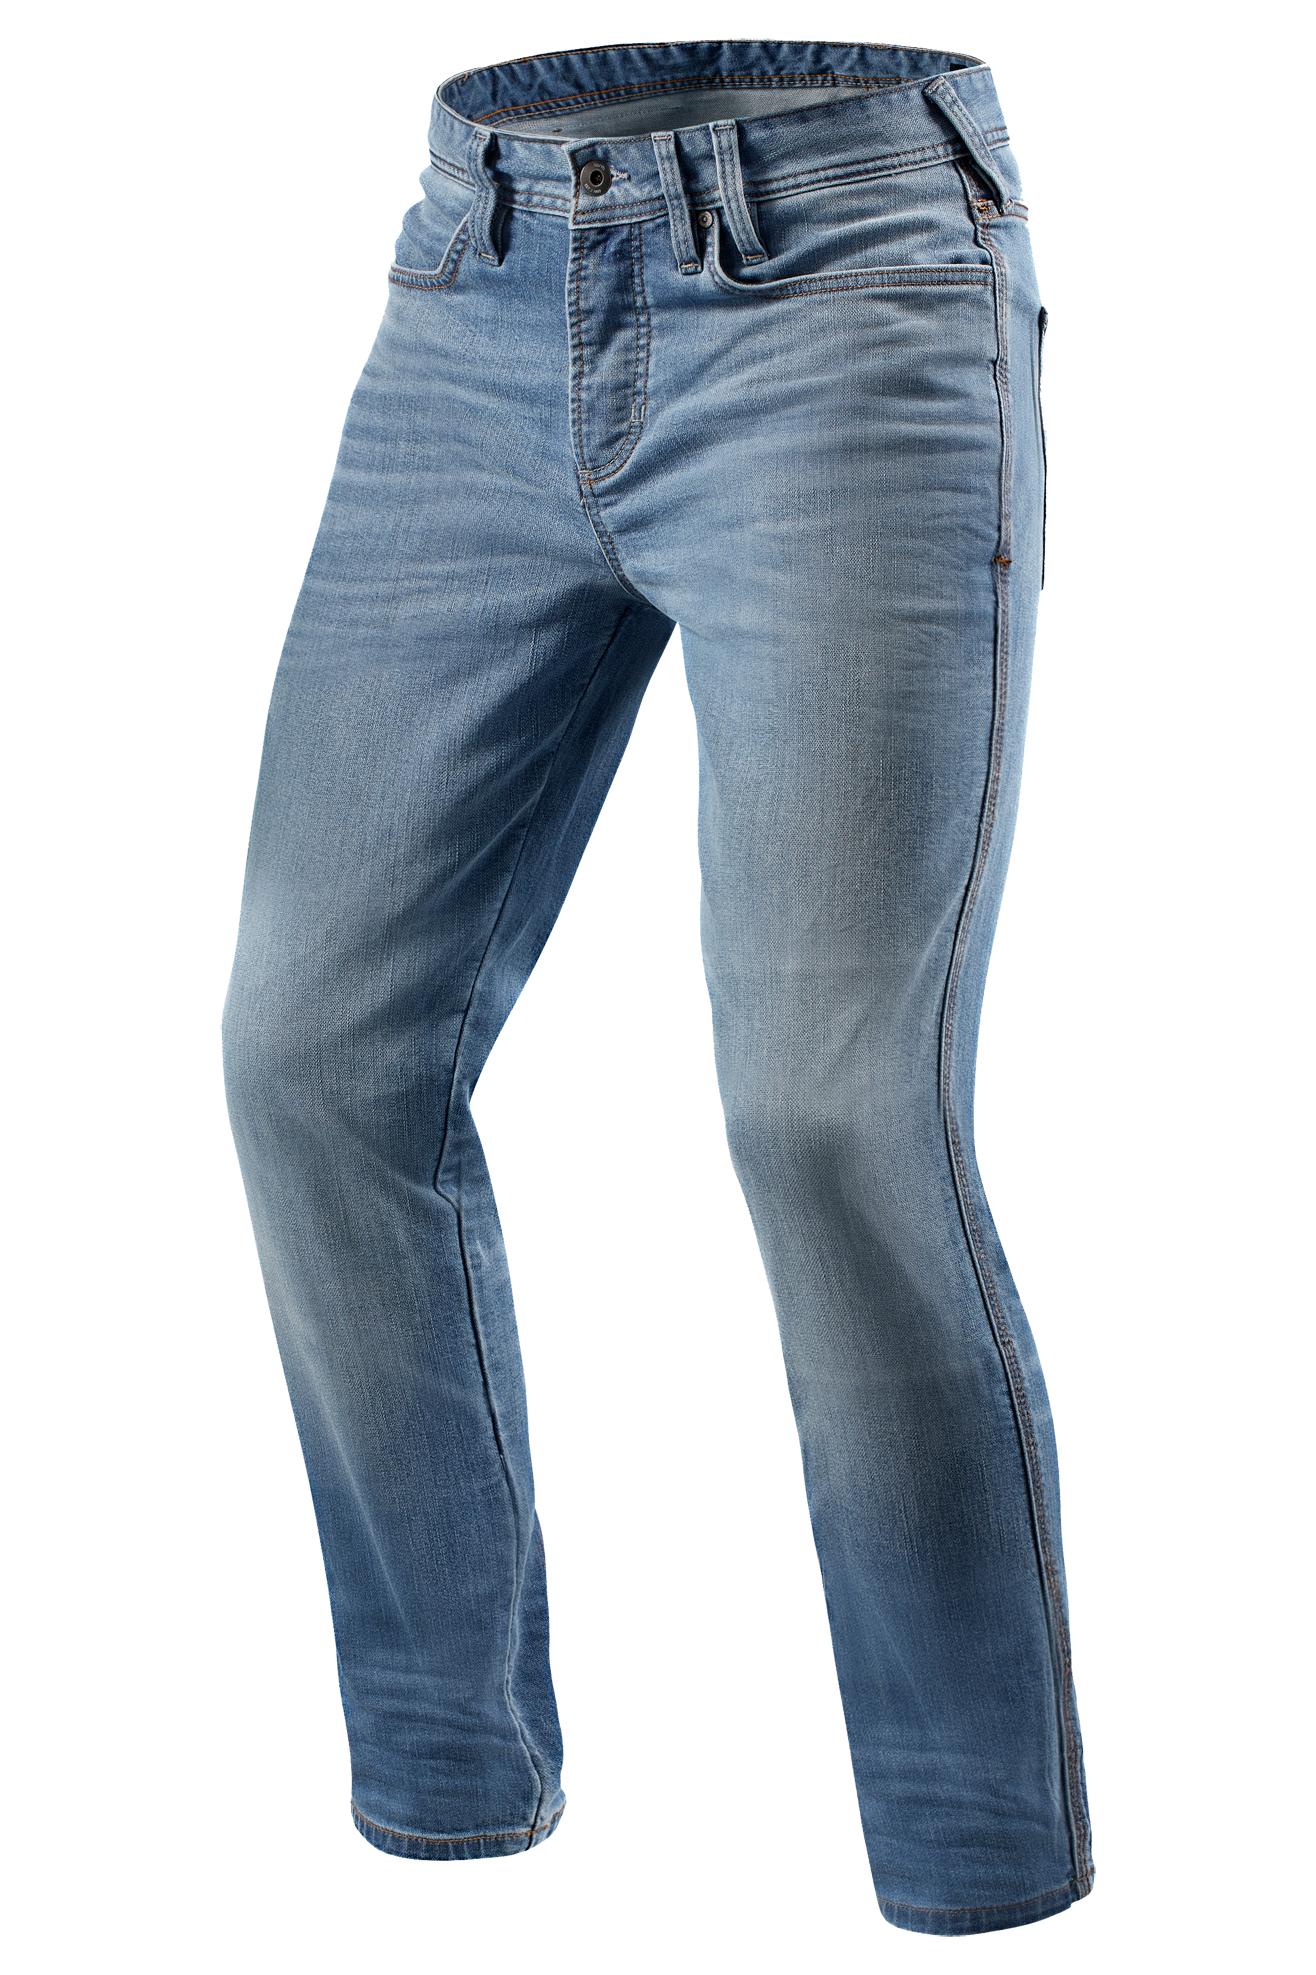 REV'IT! Jeans Moto Piston Azzurri